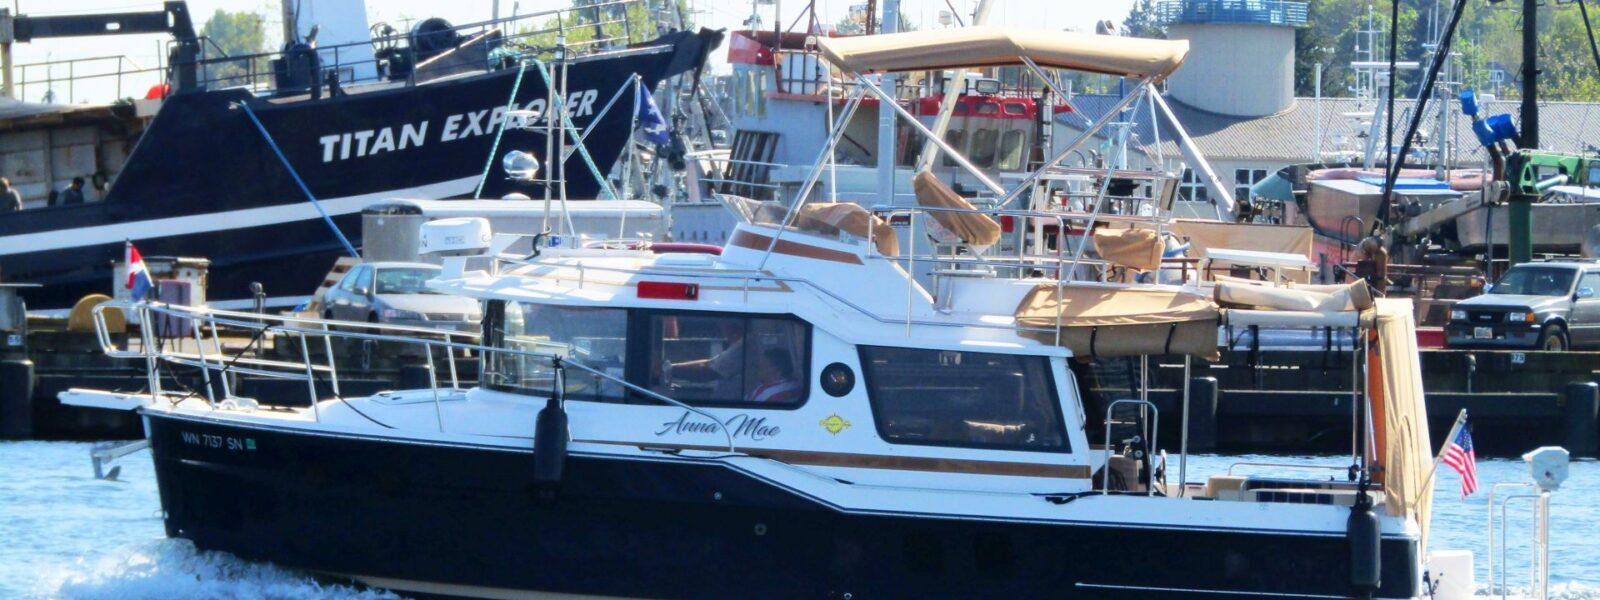 Seattle Easter Boat Parade, Powerboats, Delta Marine, Pacific Fishermen Shipyard, SBMC, Ballard Oil, Ship Canal, Seattle Marine Traffic Underway, Salty Dog Boating